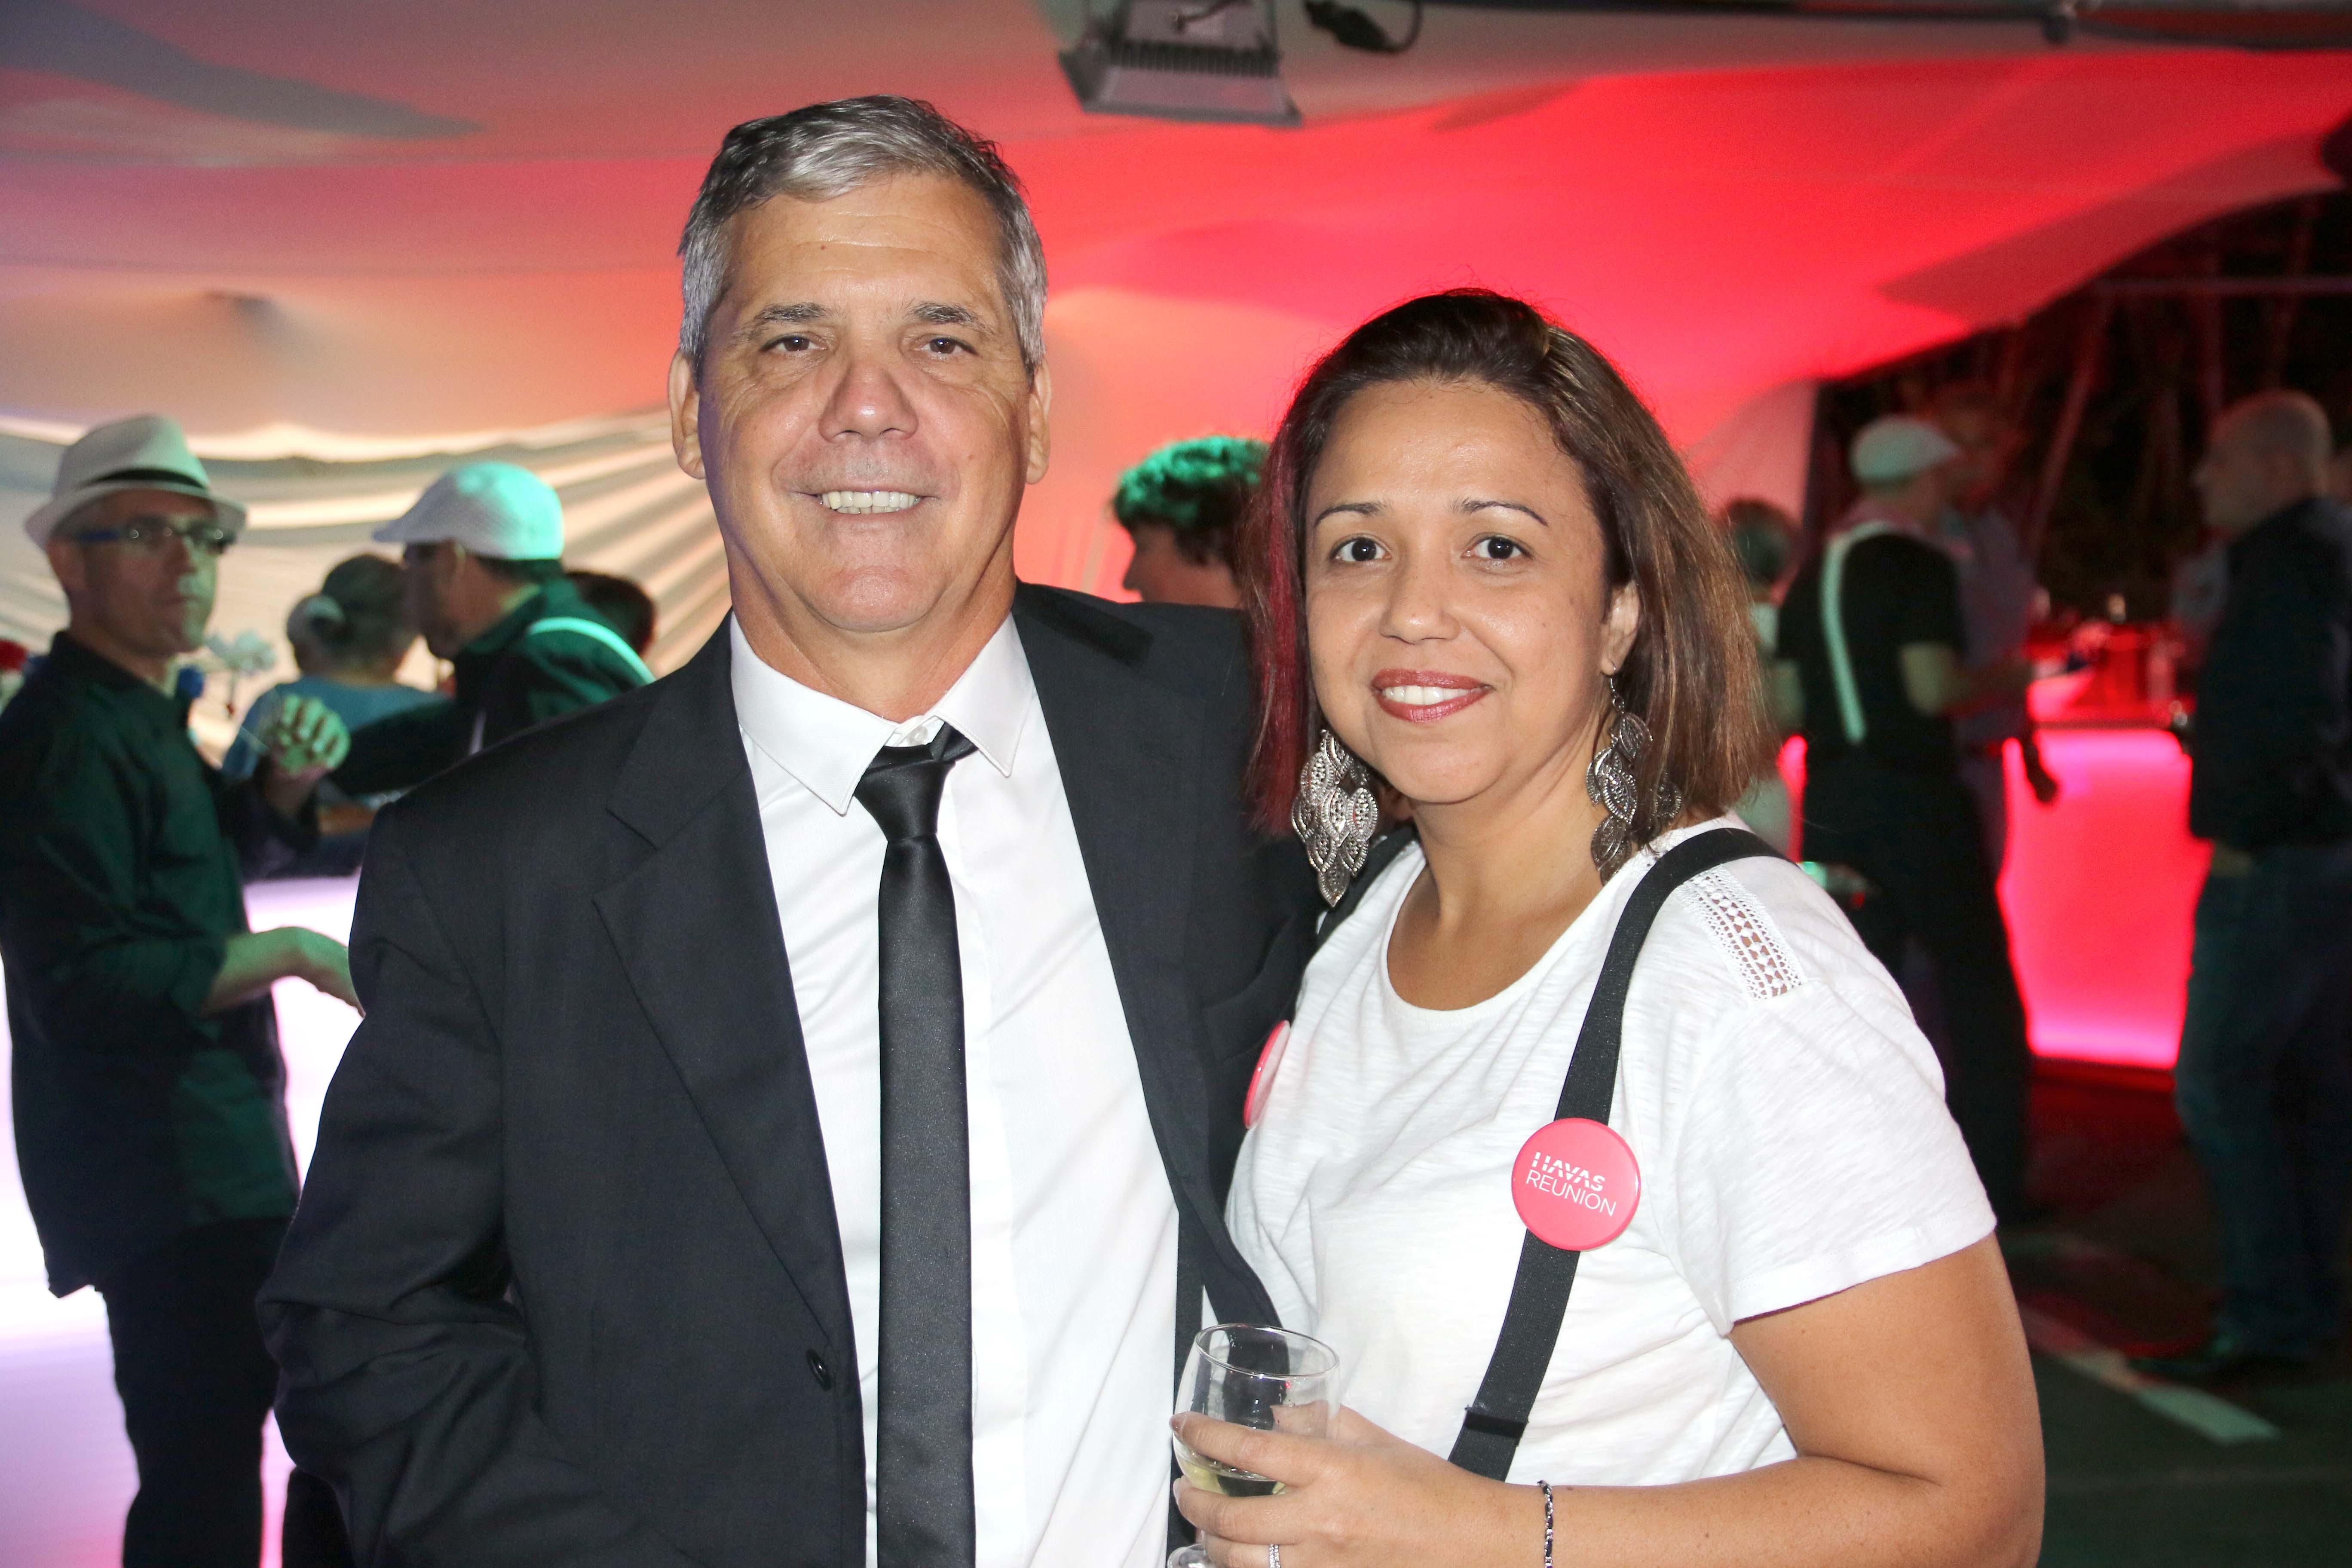 Luis Vieira et sa collaboratrice Valérie Léger